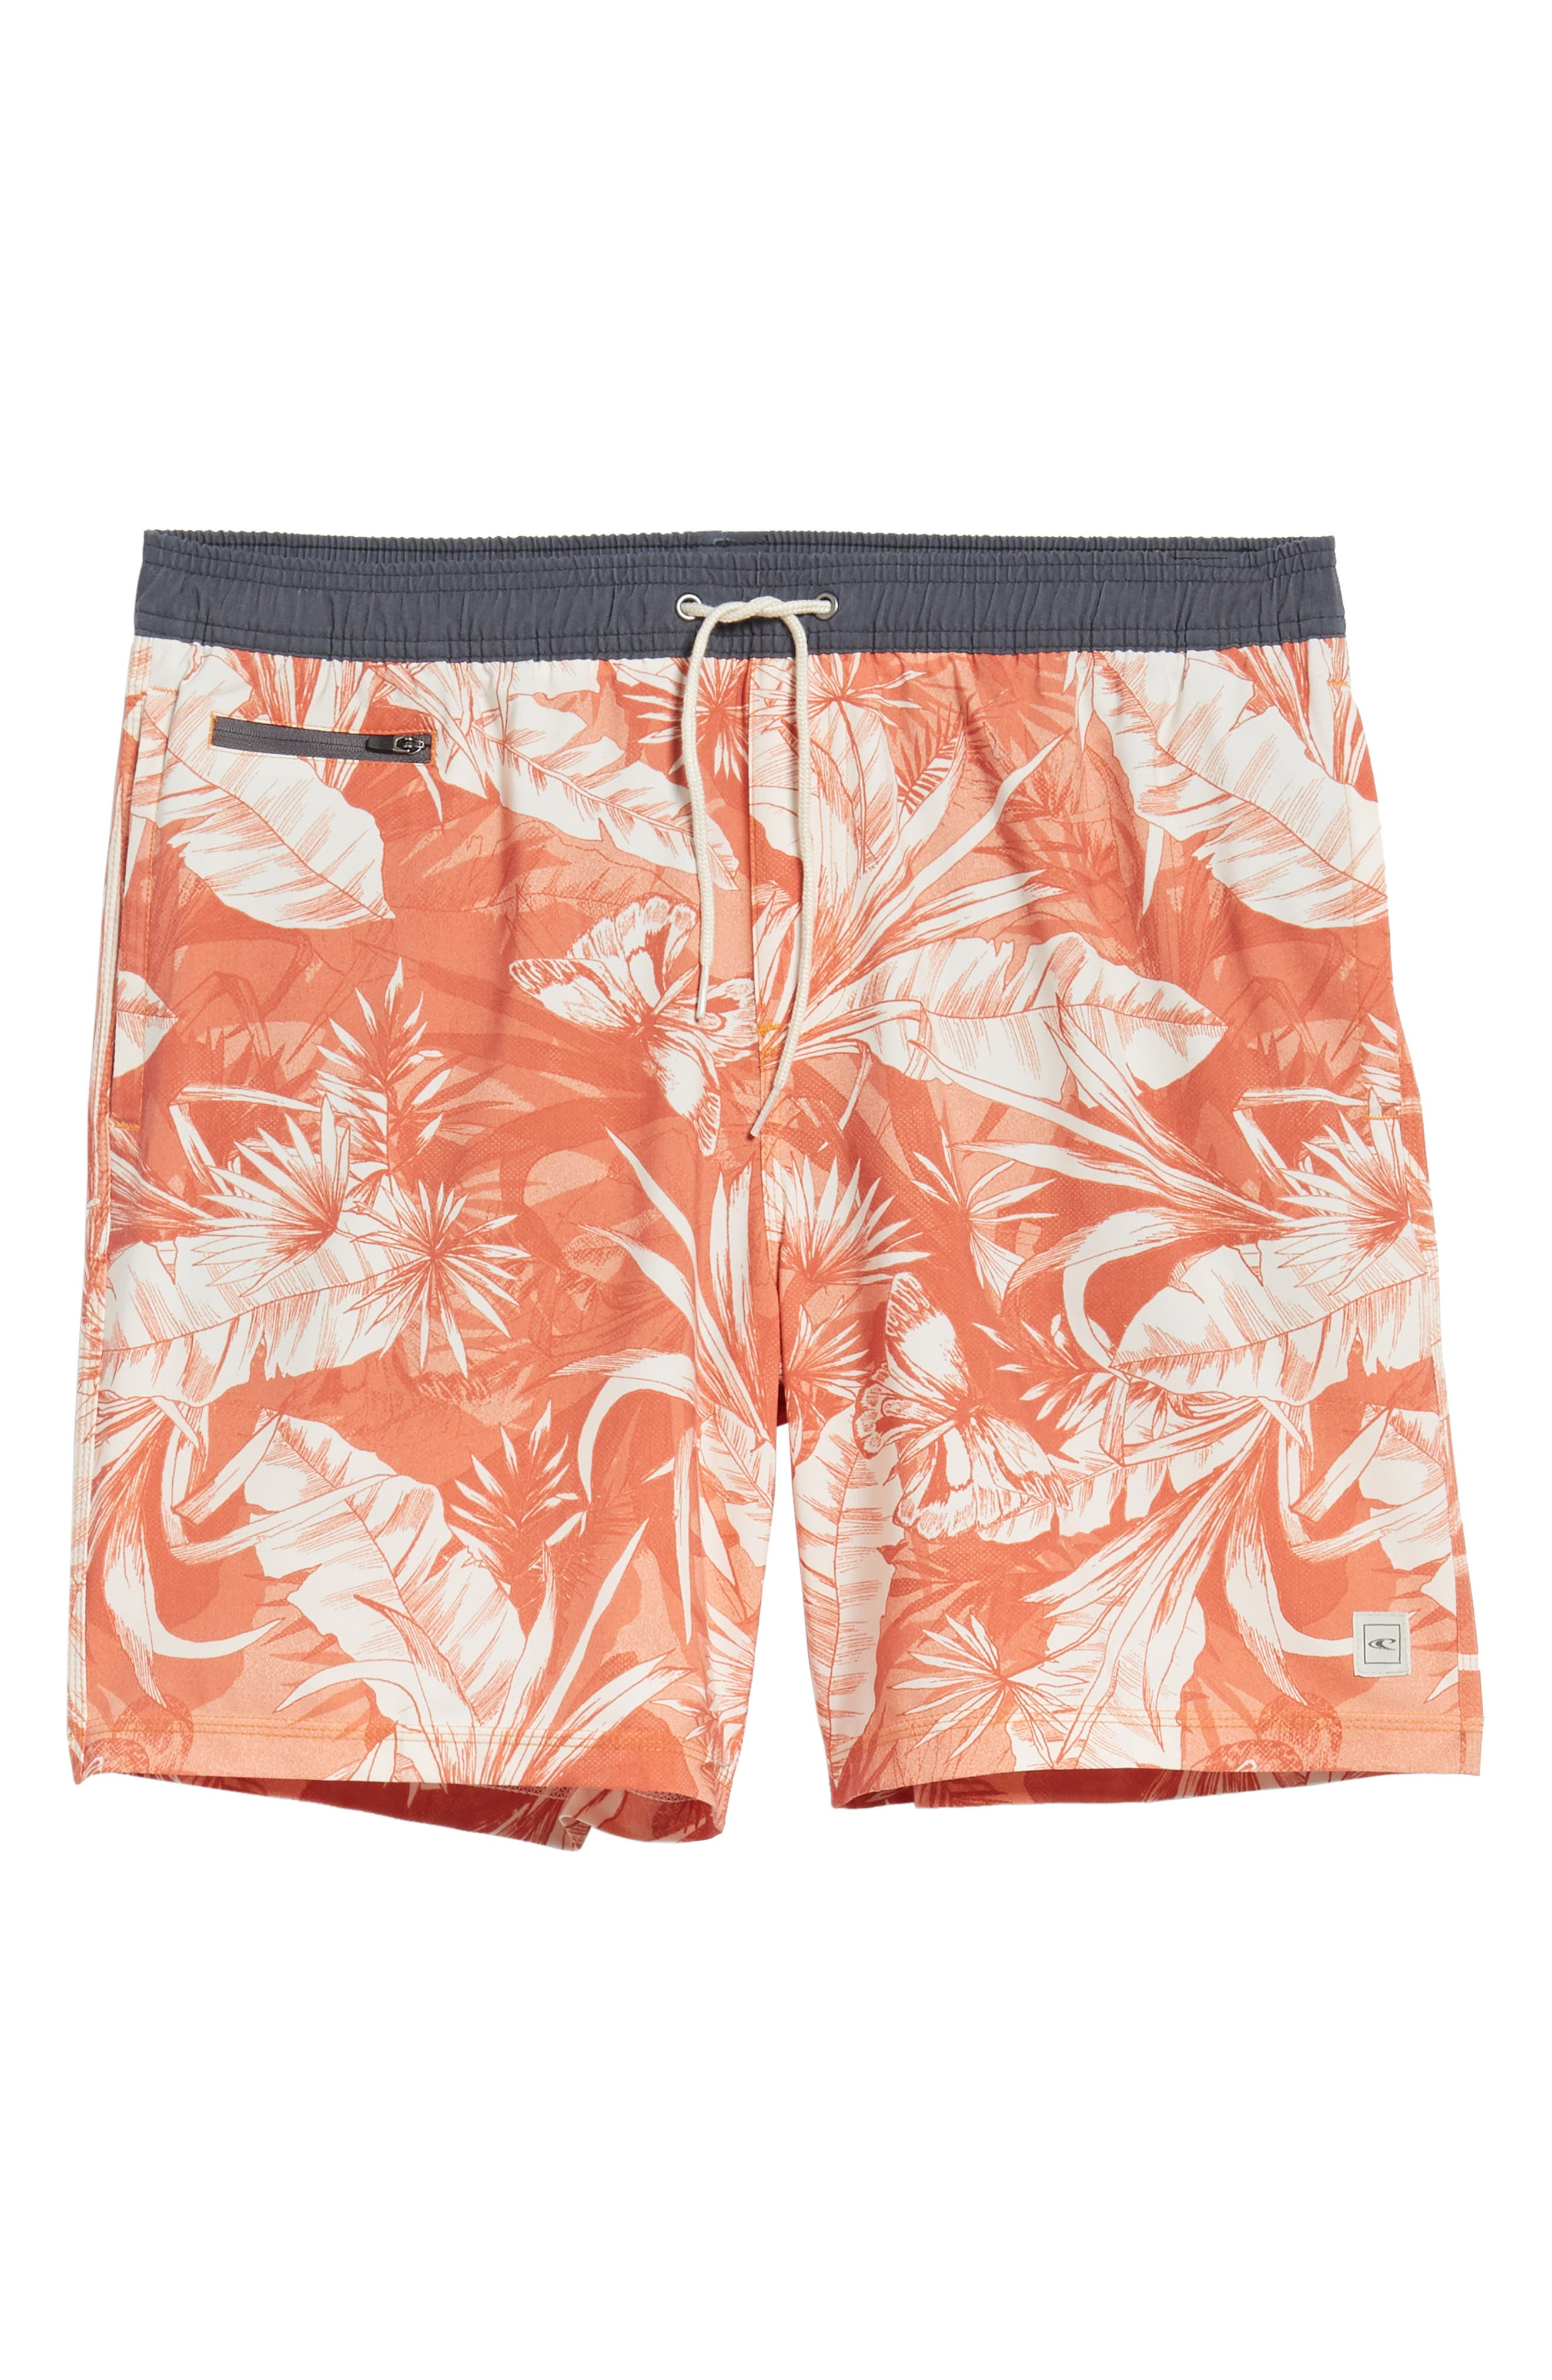 Sunset Board Shorts,                             Alternate thumbnail 6, color,                             214